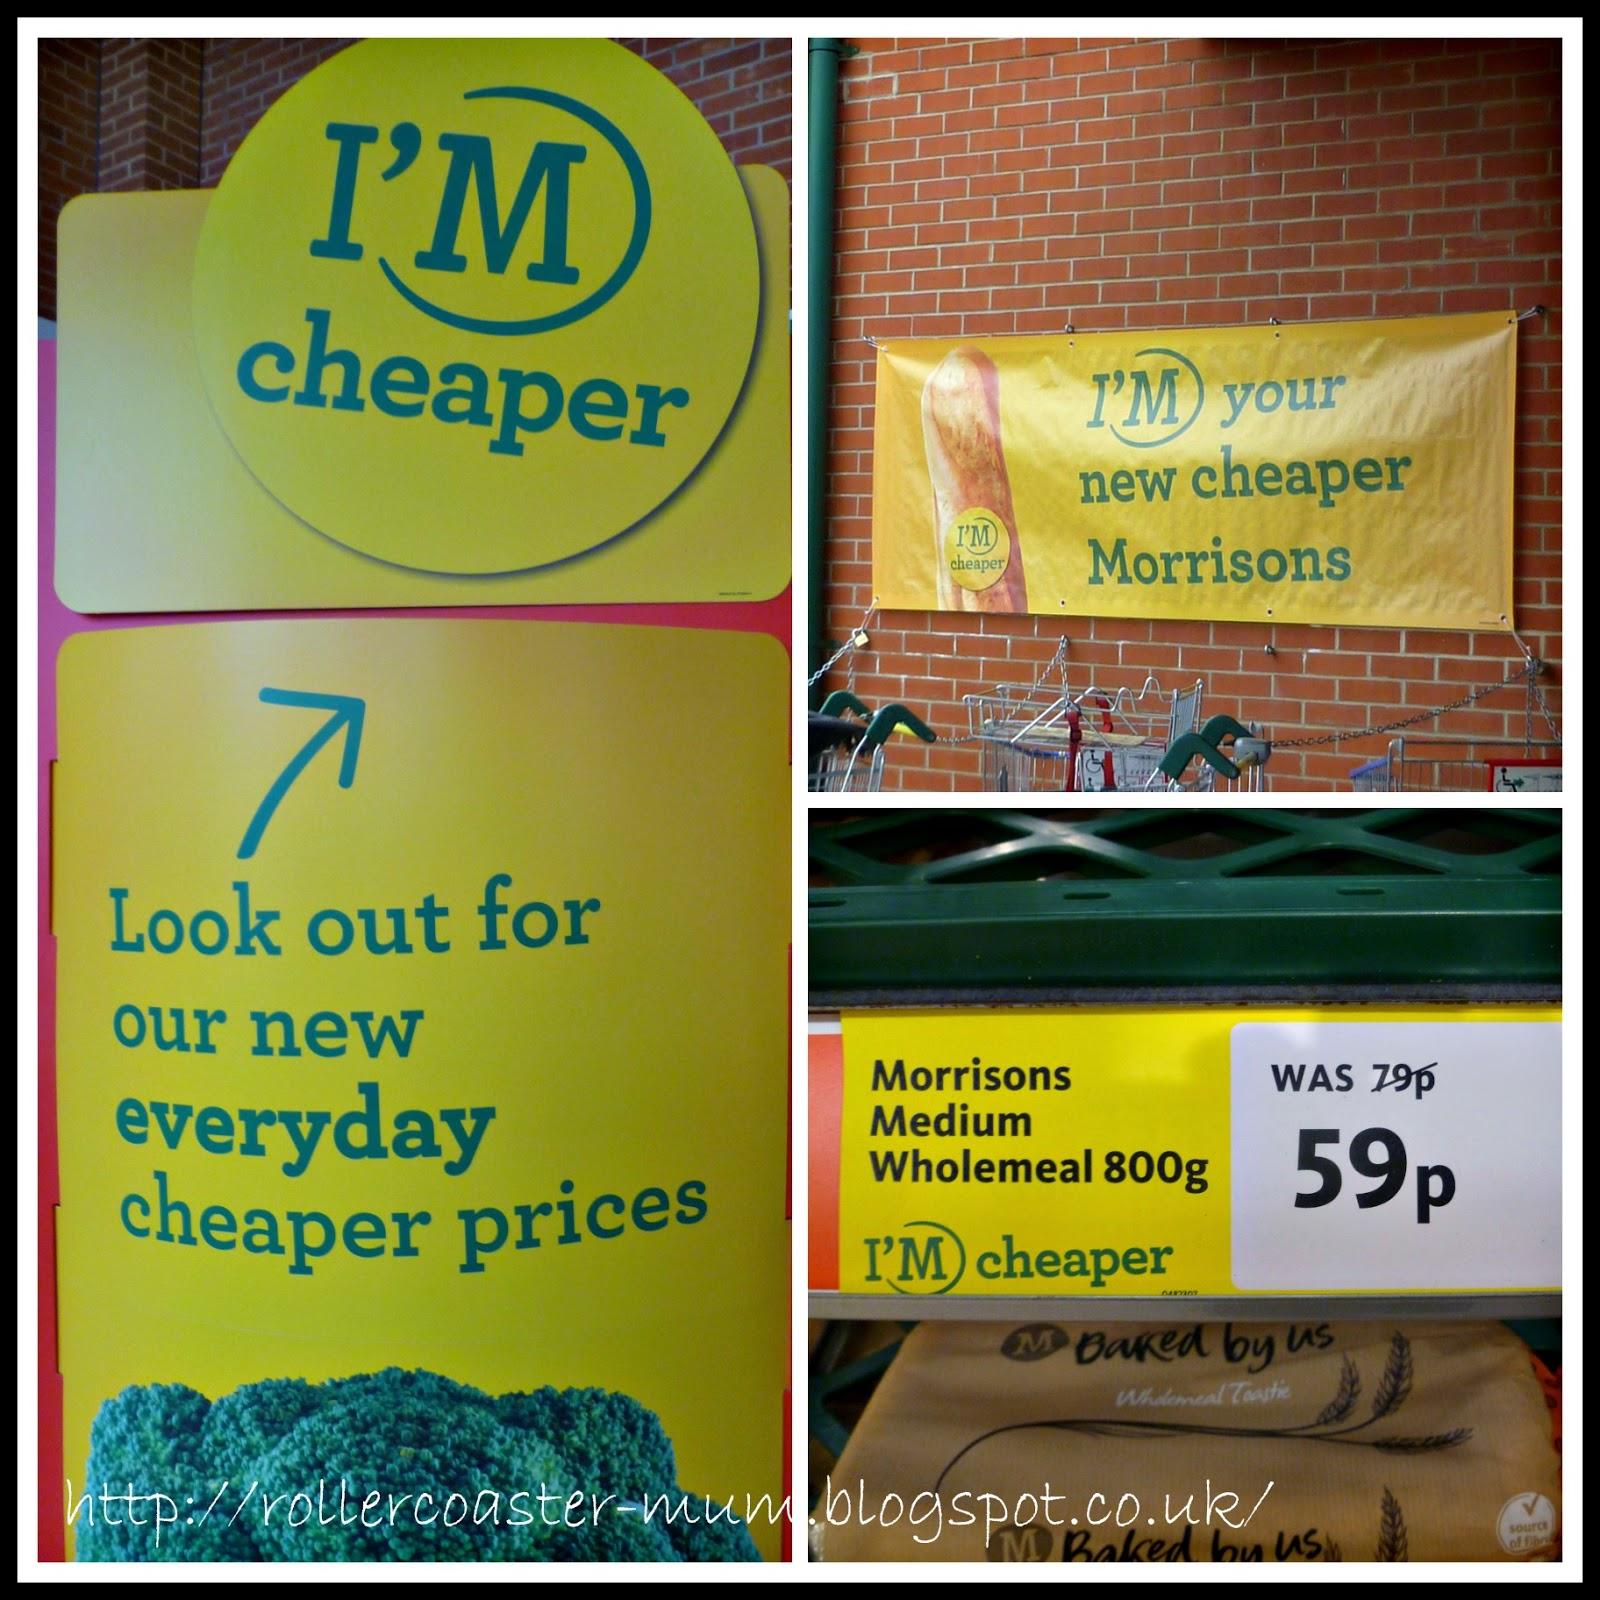 Morrisons I'm Cheaper campaign posters #MorrisonsMum